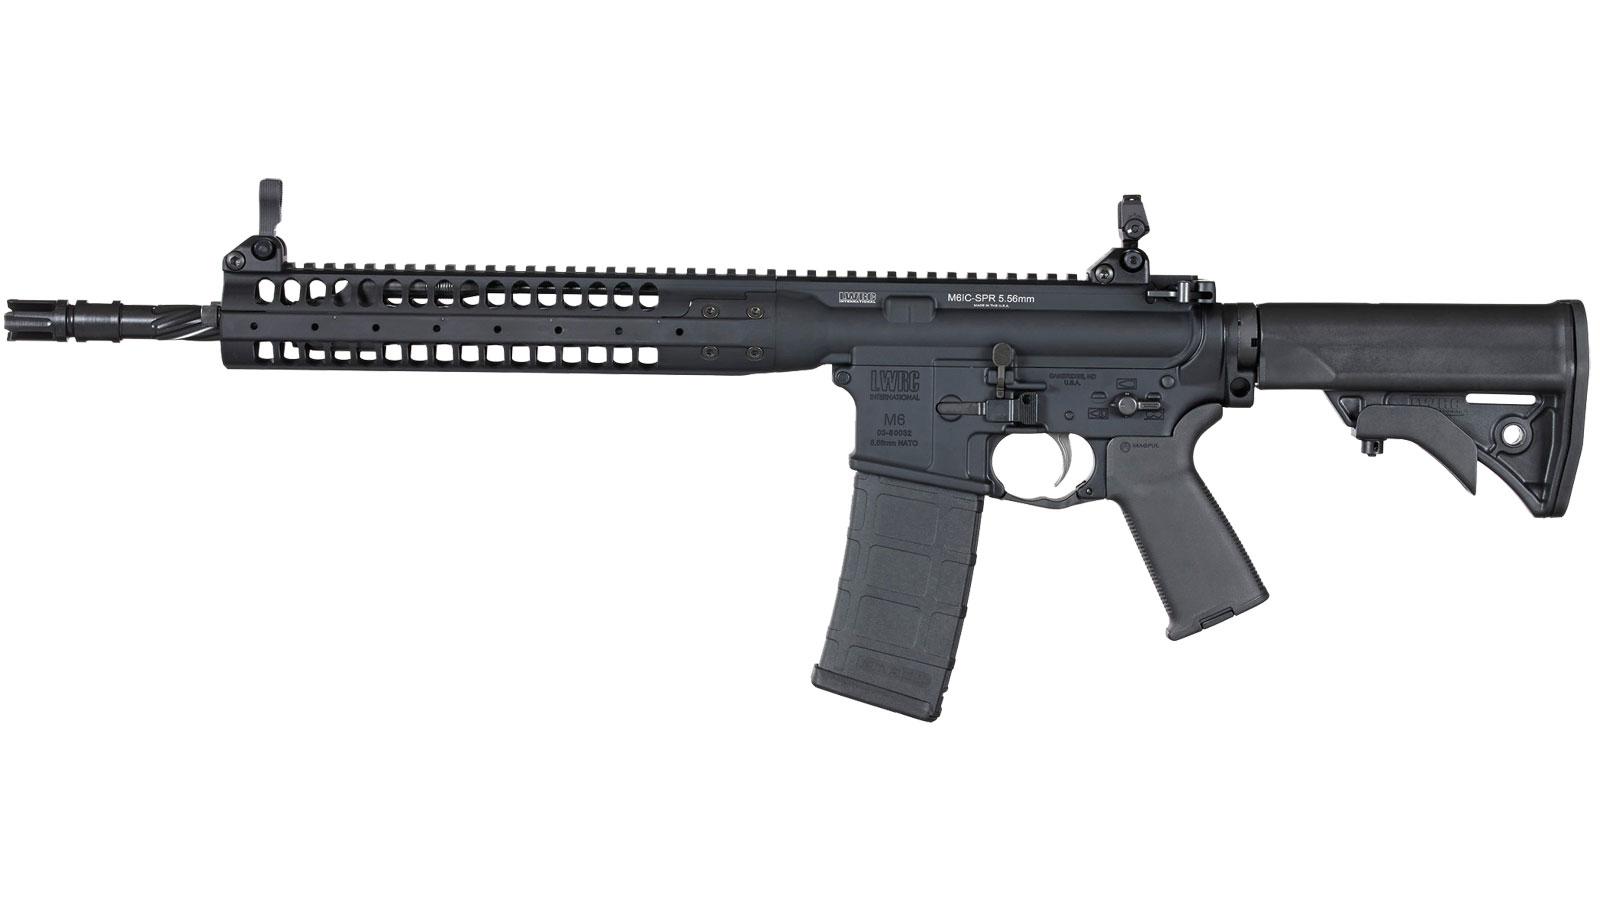 LWRC ICR5B14PSPR Individual Carbine SPR Semi-Automatic 223 Remington|5.56 NATO 14.7 30+1 Adjustable Black Stk Black in.